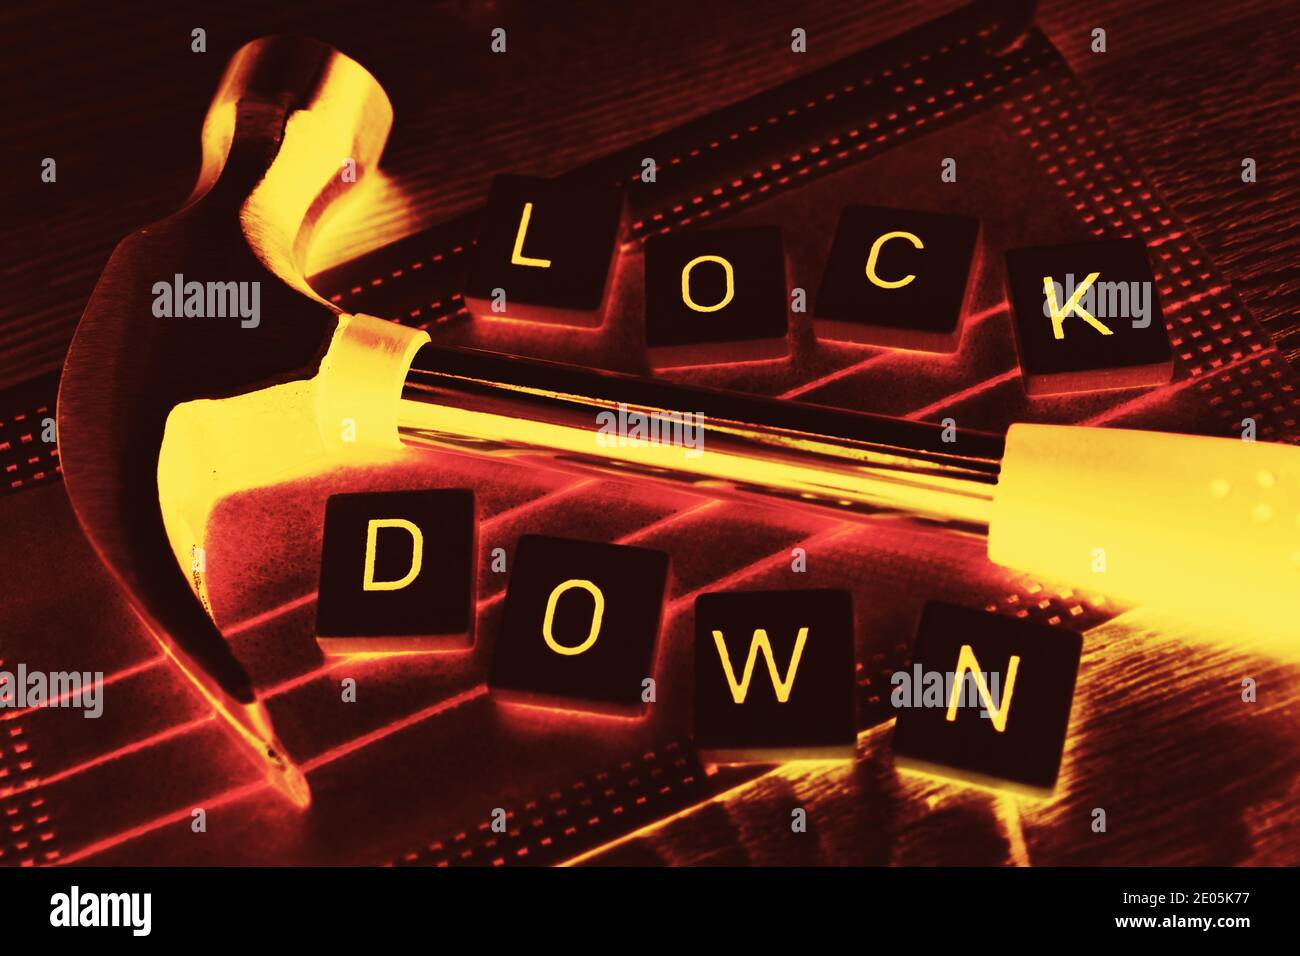 Hammer On Face Mask, Corona Lockdown Stock Photo